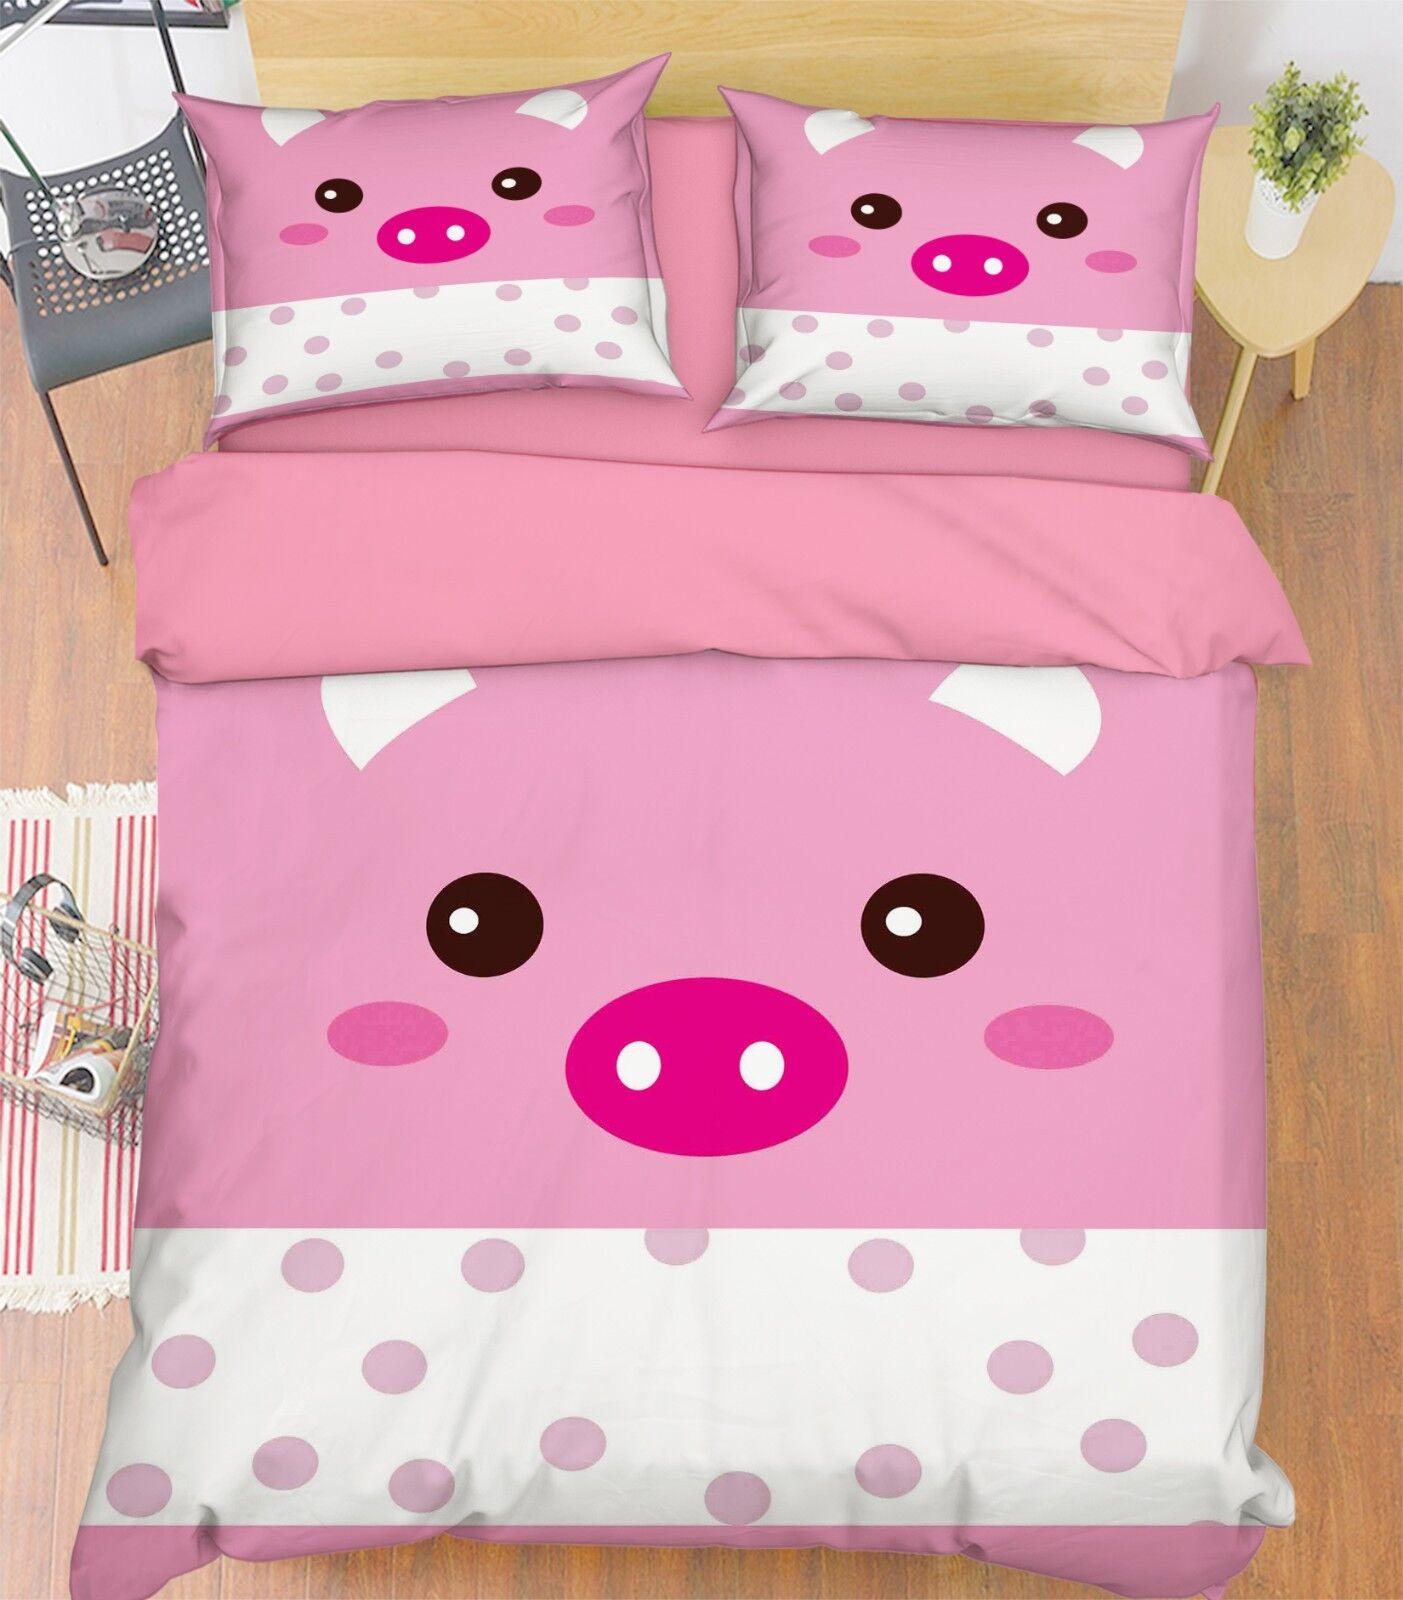 3D Pig Pattern 3 Bed Pillowcases Quilt Duvet Cover Set Single Queen King Größe AU